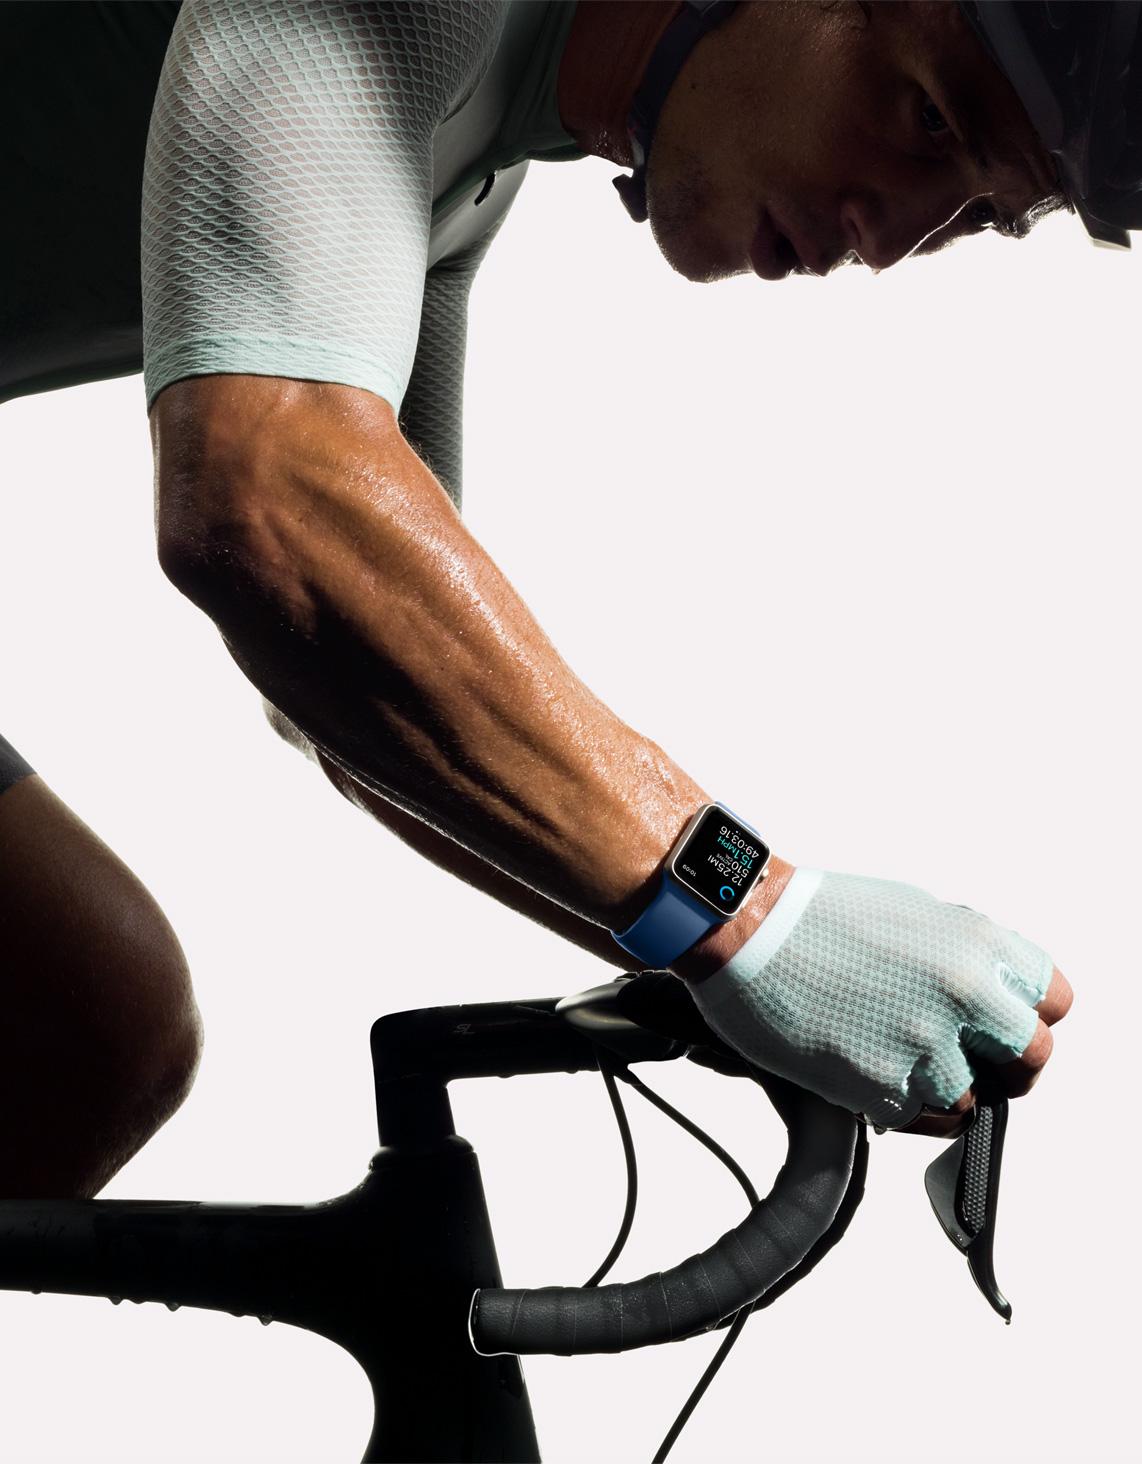 apple-watch2-cycling.jpg